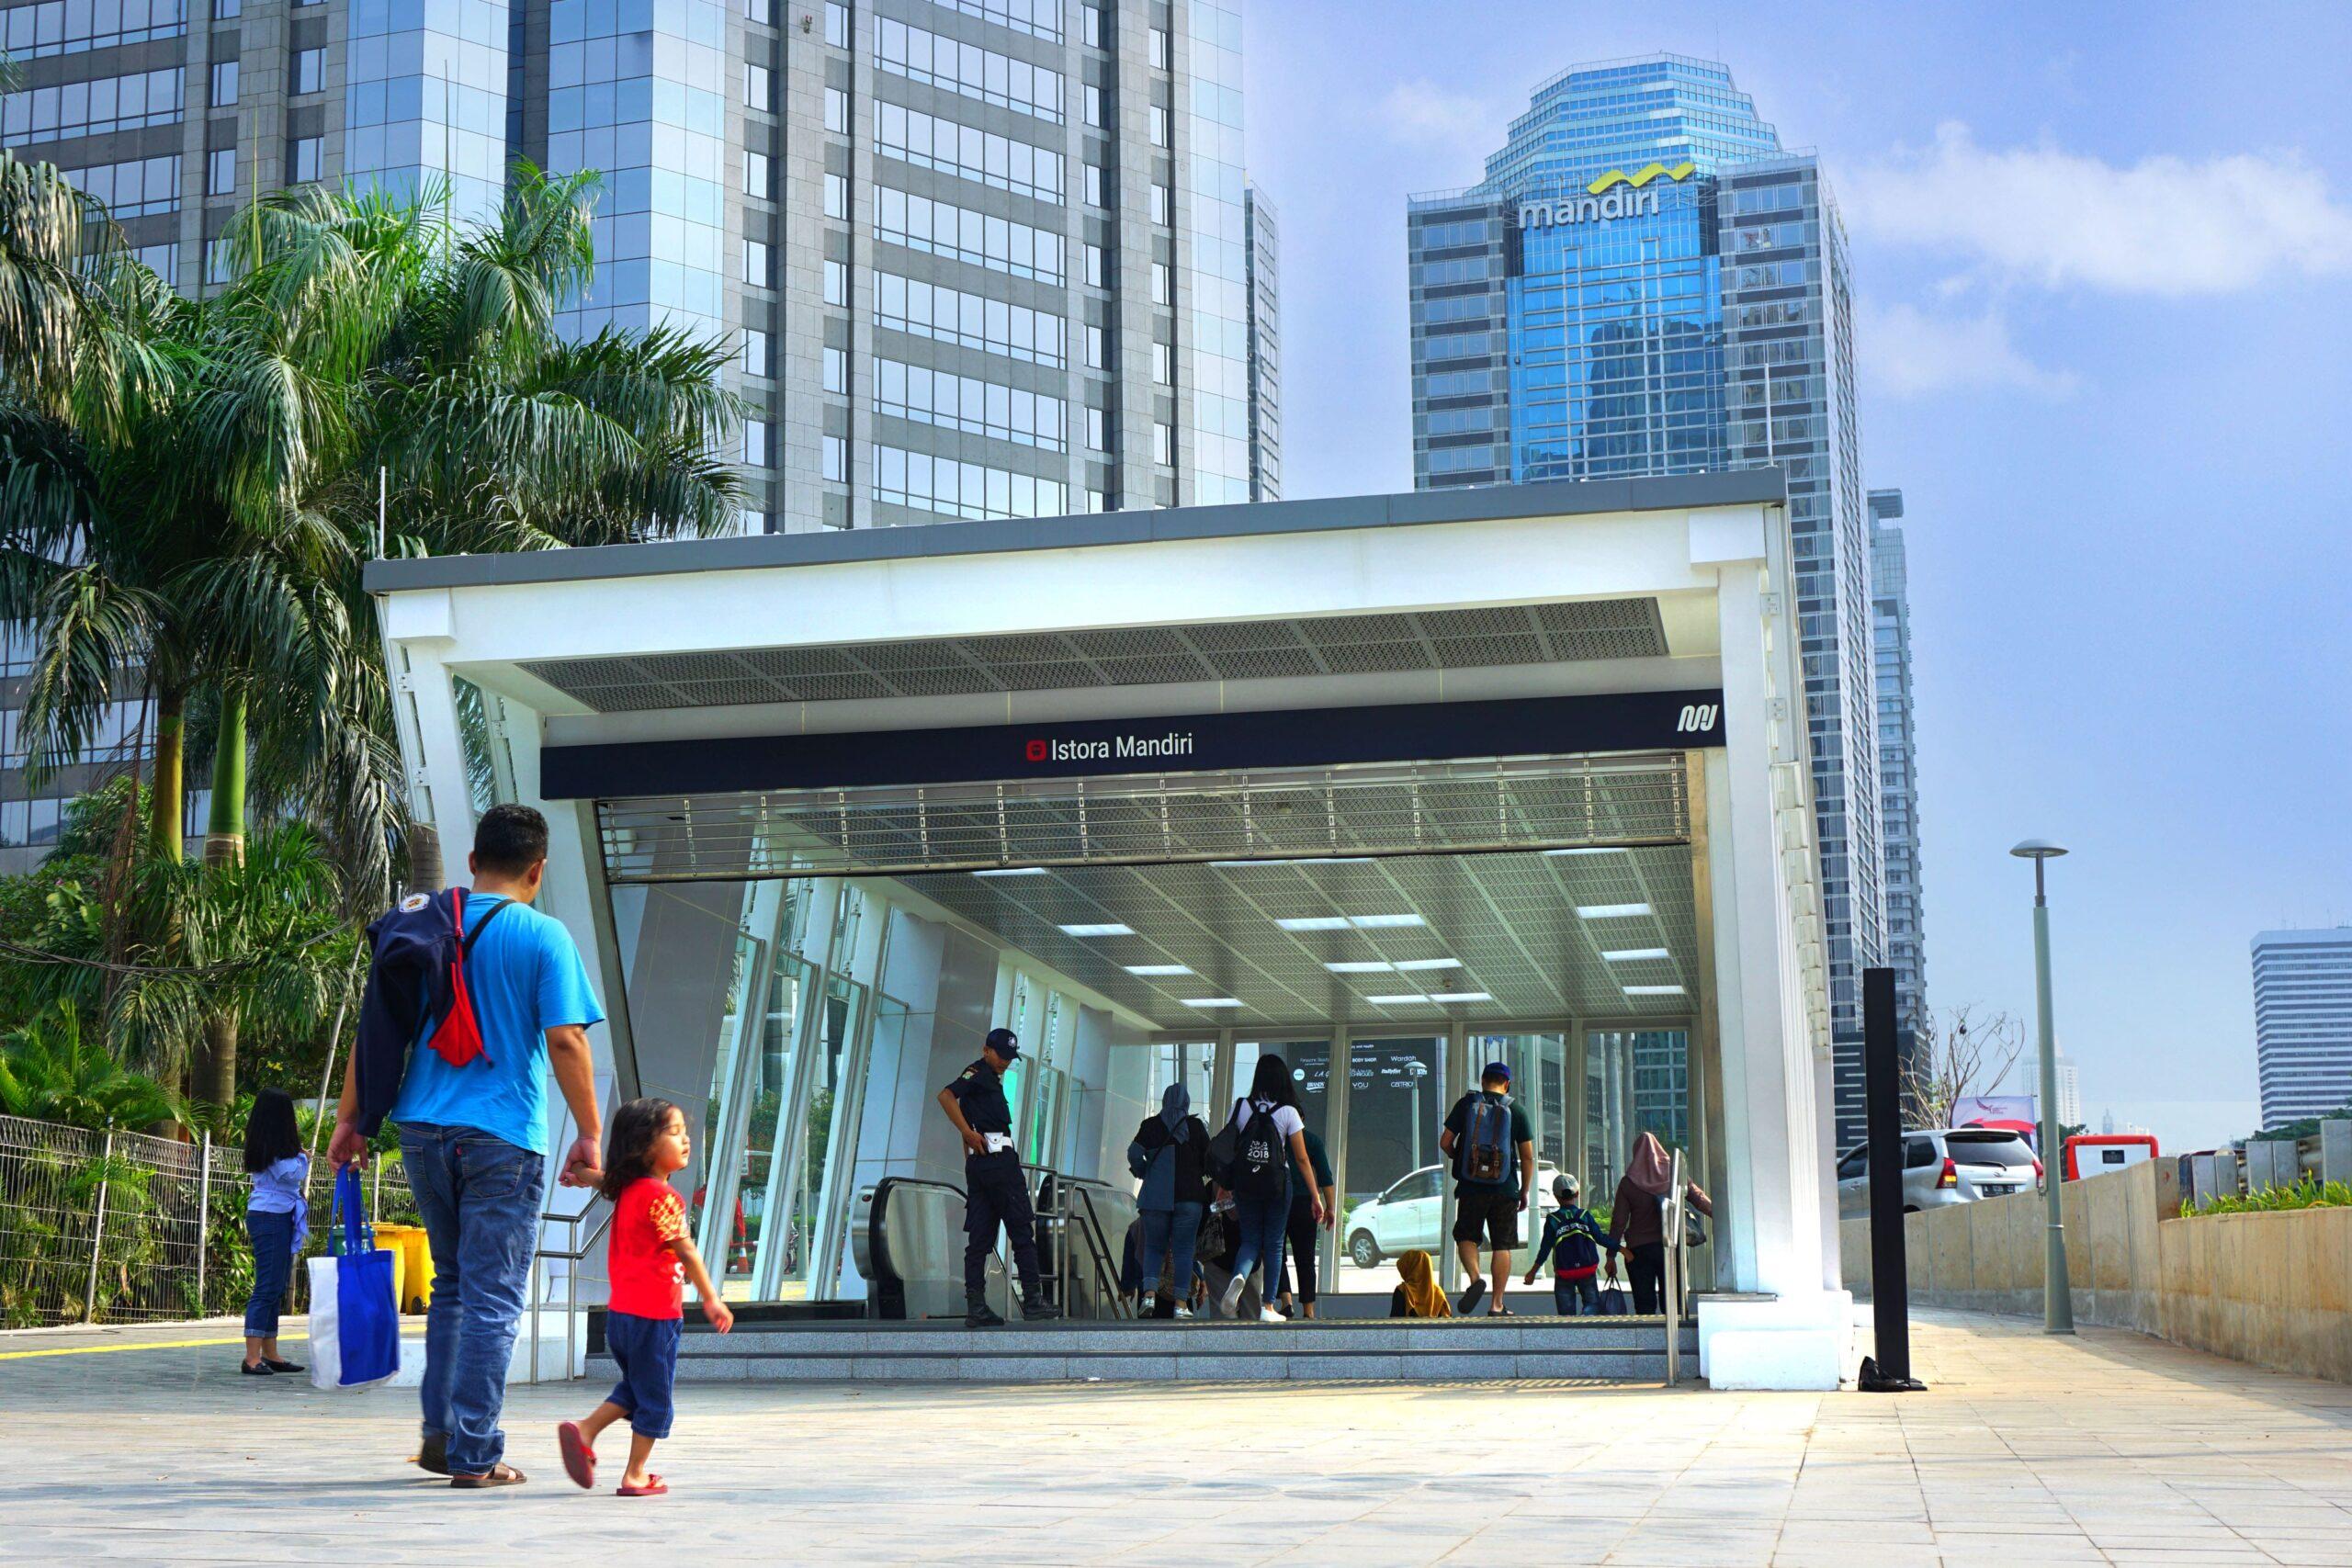 Jakarta-maas-Lyko-Thales-JetLindo-Jaklingo-Aino-payment